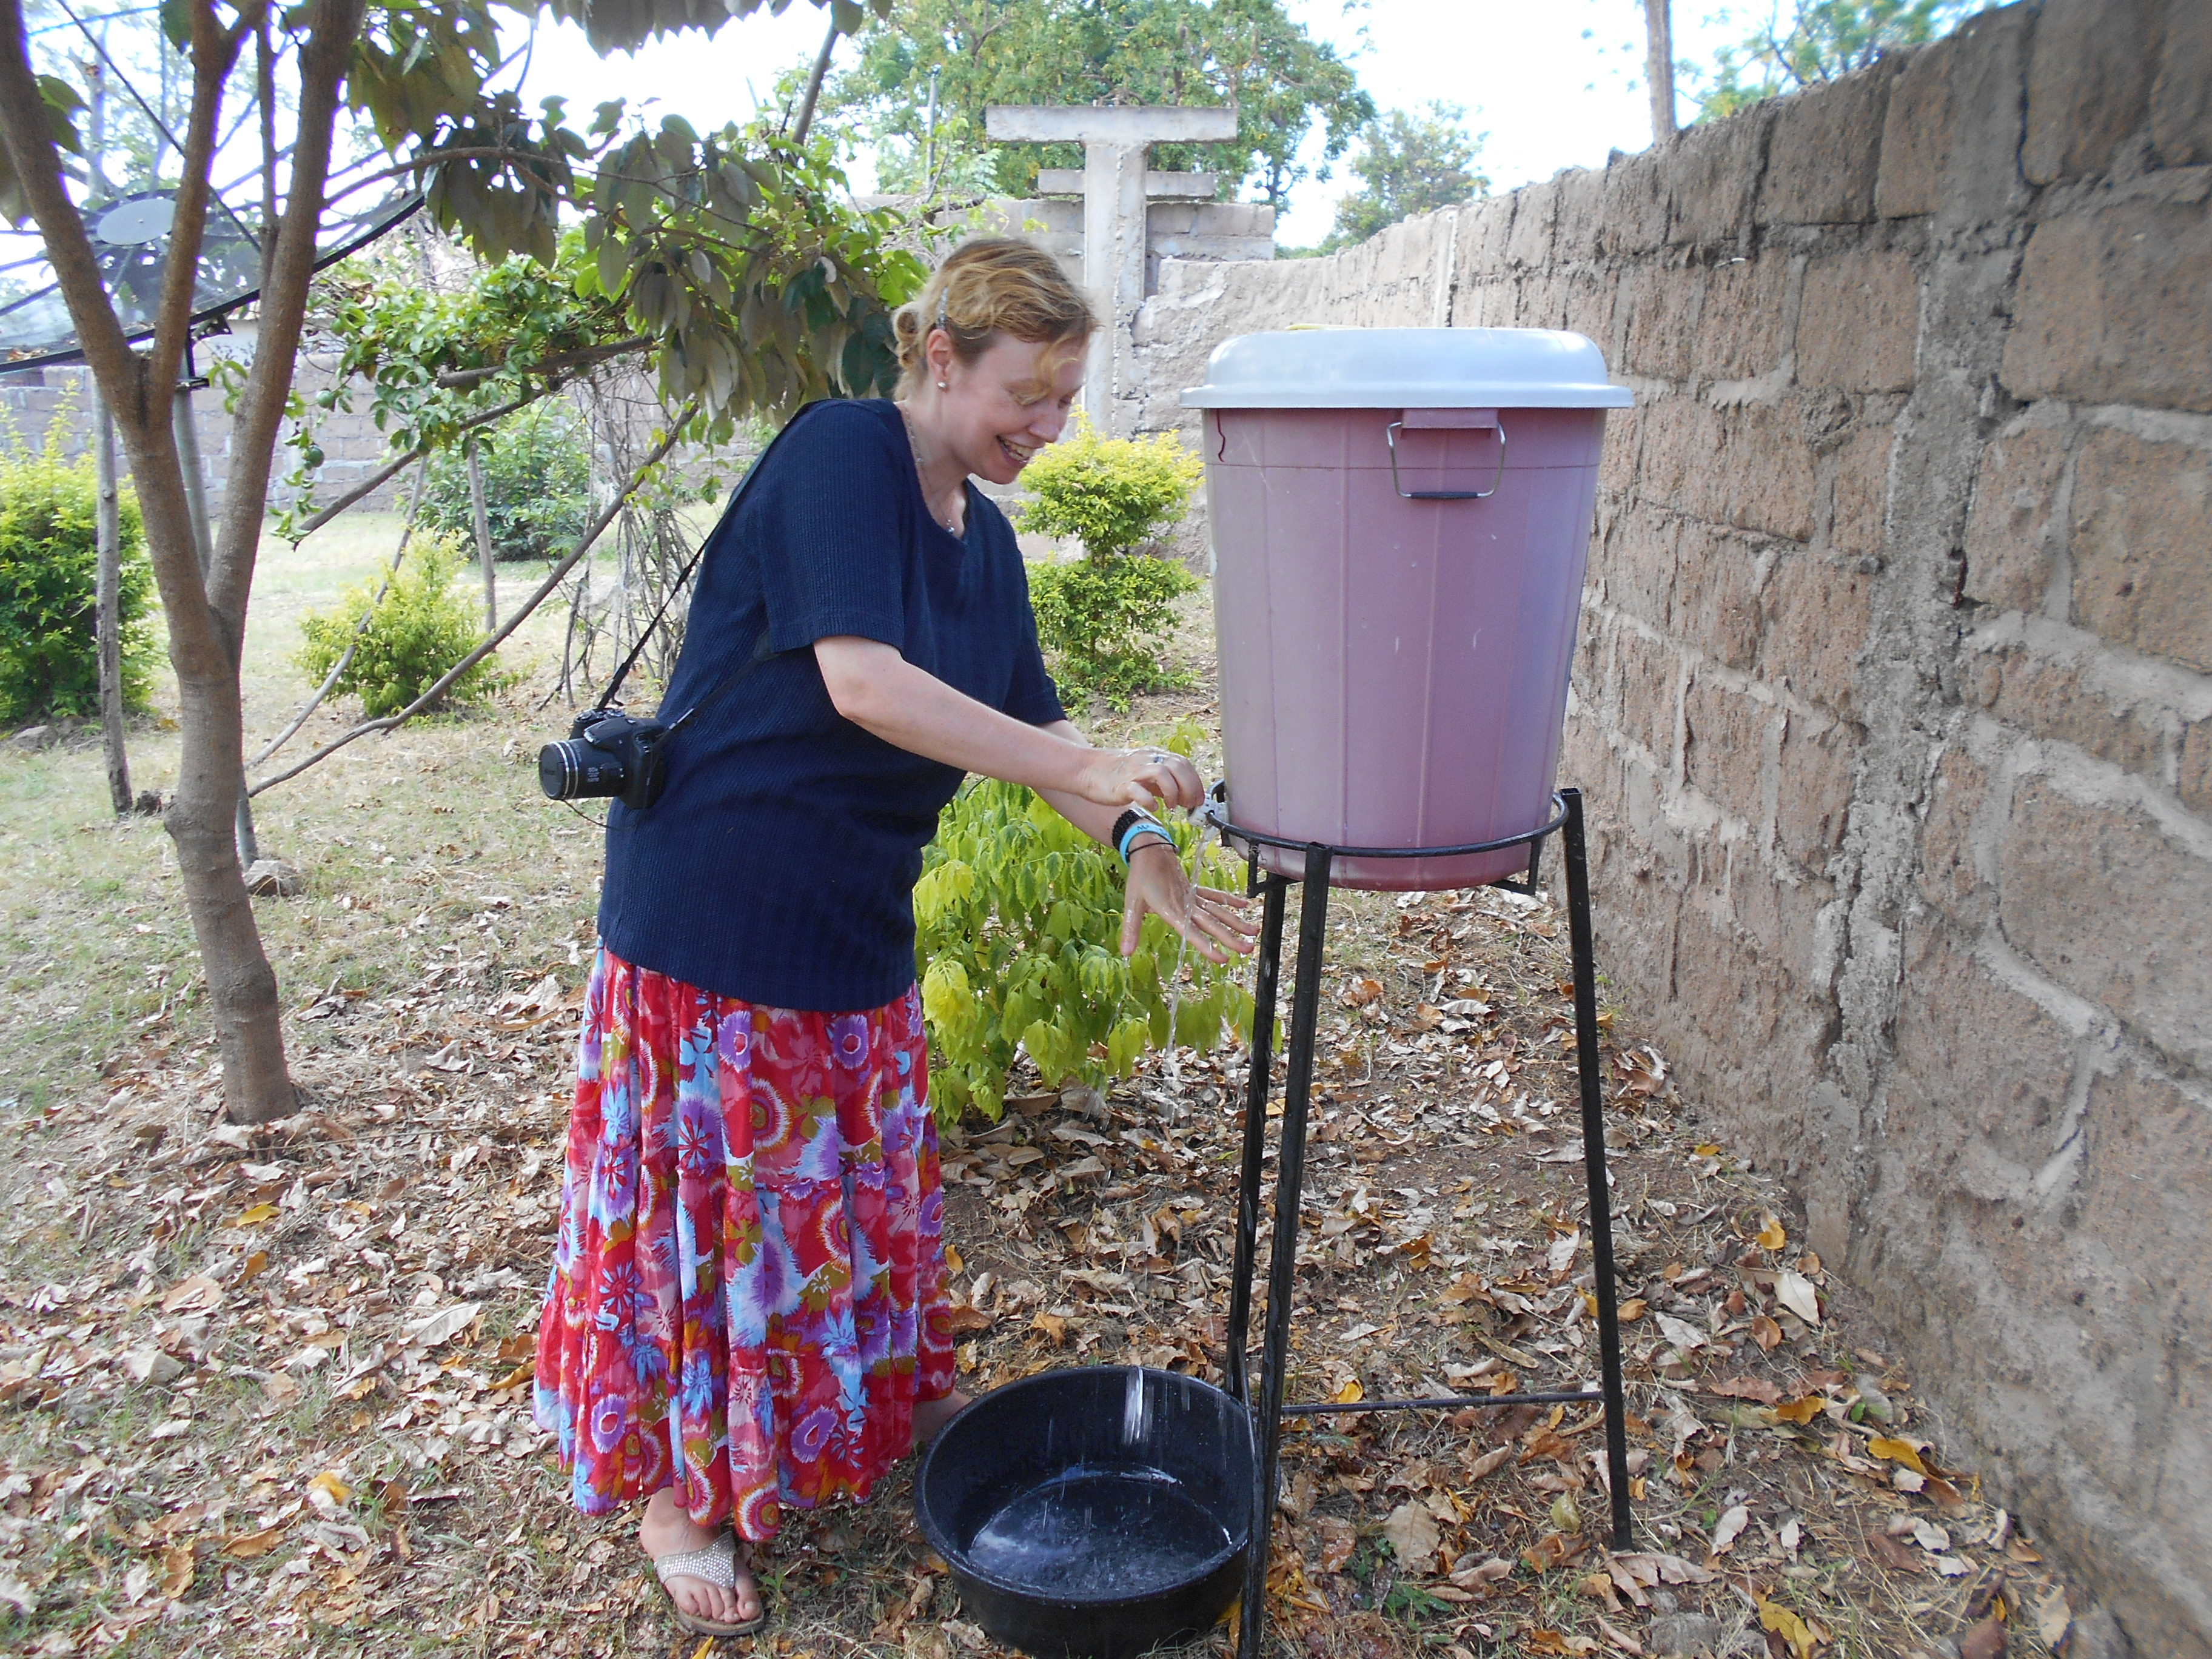 Susan washing her hands in Shirati